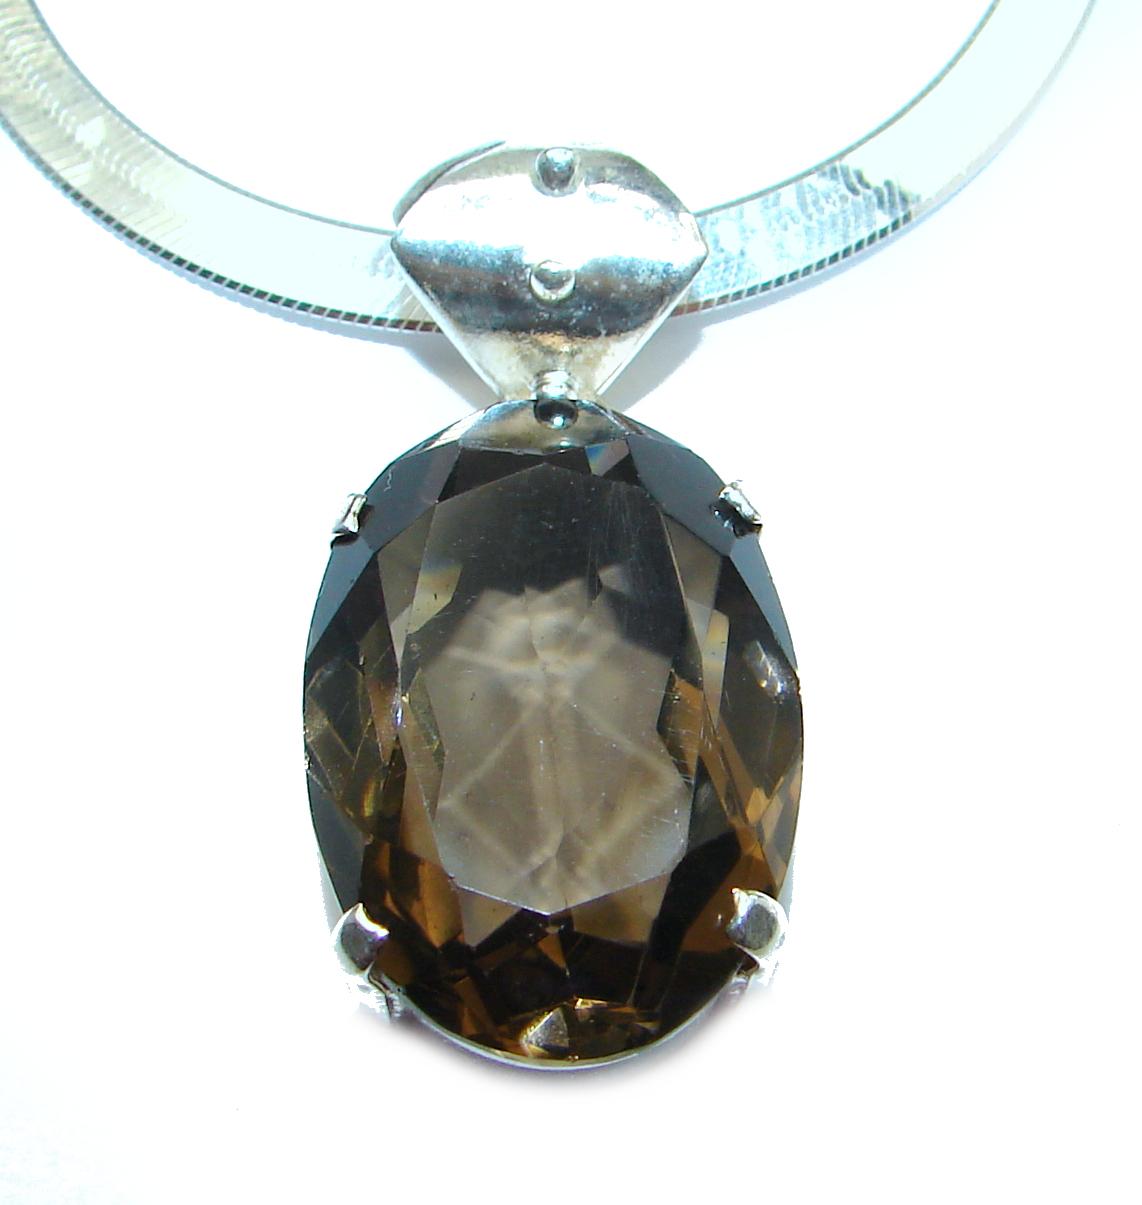 Cleopatra Smoky Topaz .925 Sterling Silver handmade necklace